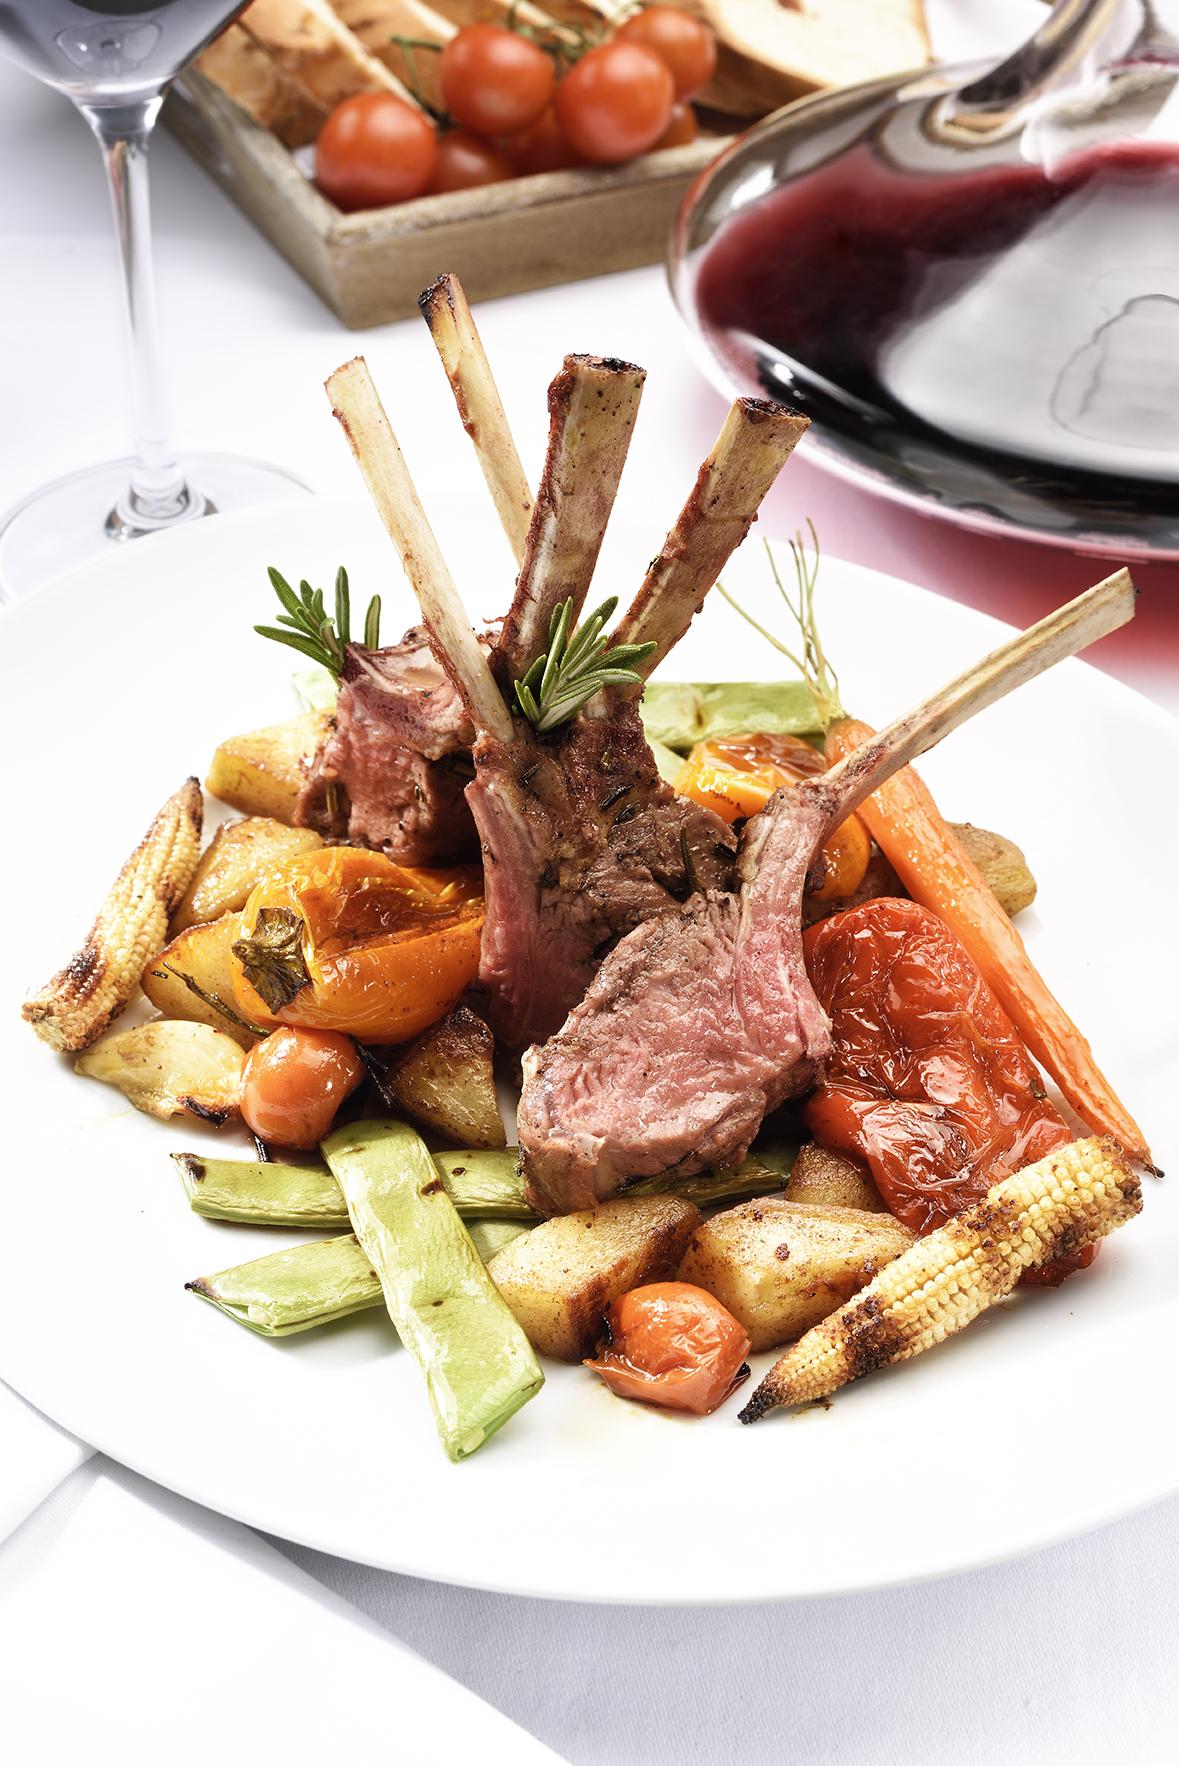 http://sandrorestaurante.com/wp-content/uploads/2017/01/piatto-193.jpg